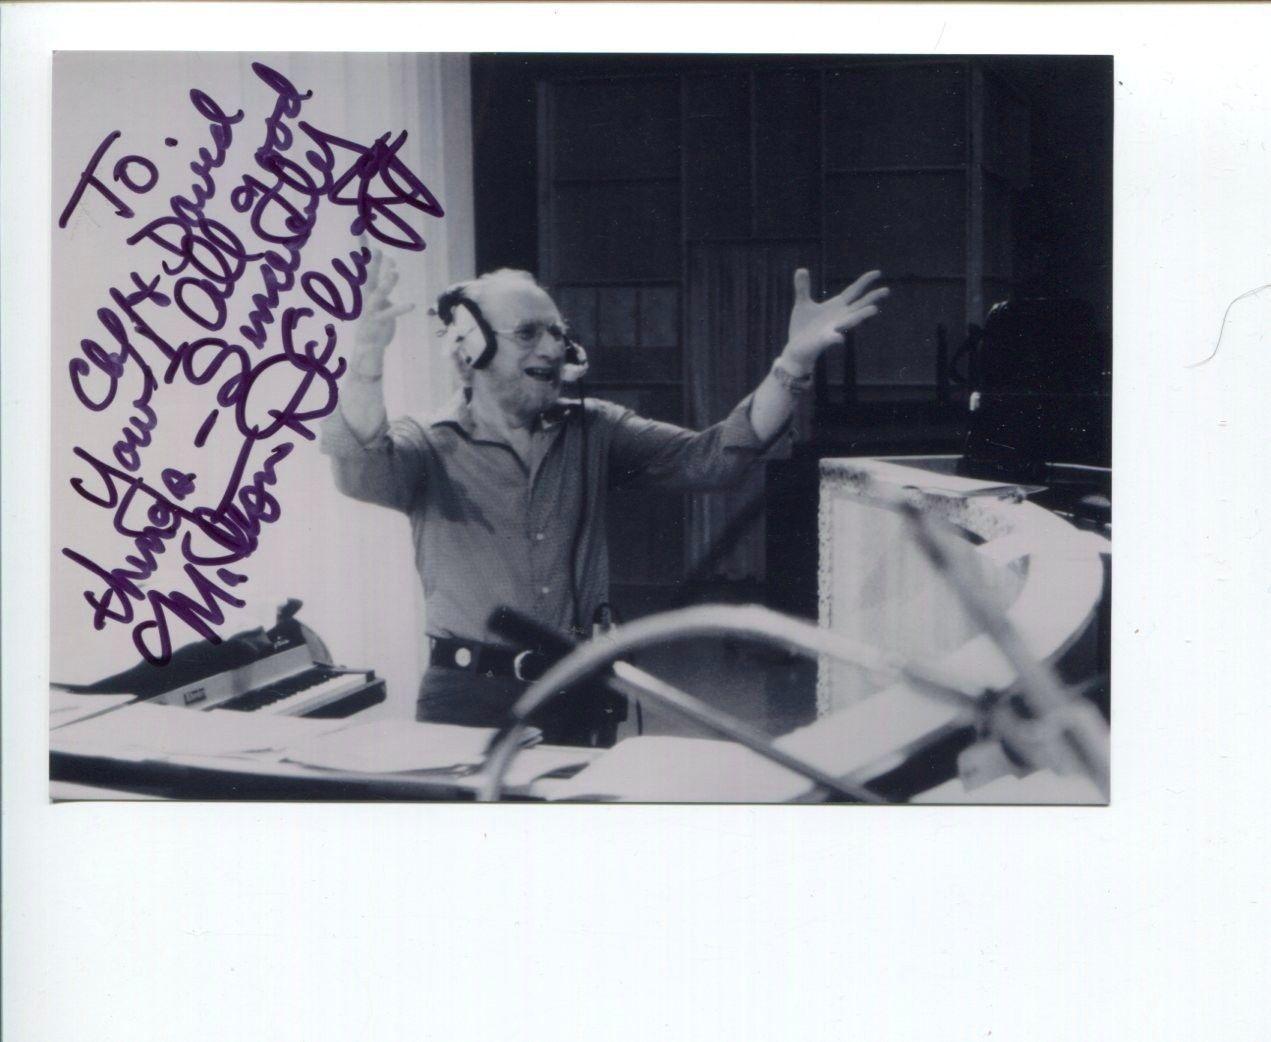 Milton DeLugg Jazz Big Band Composer Signed Autograph Photo